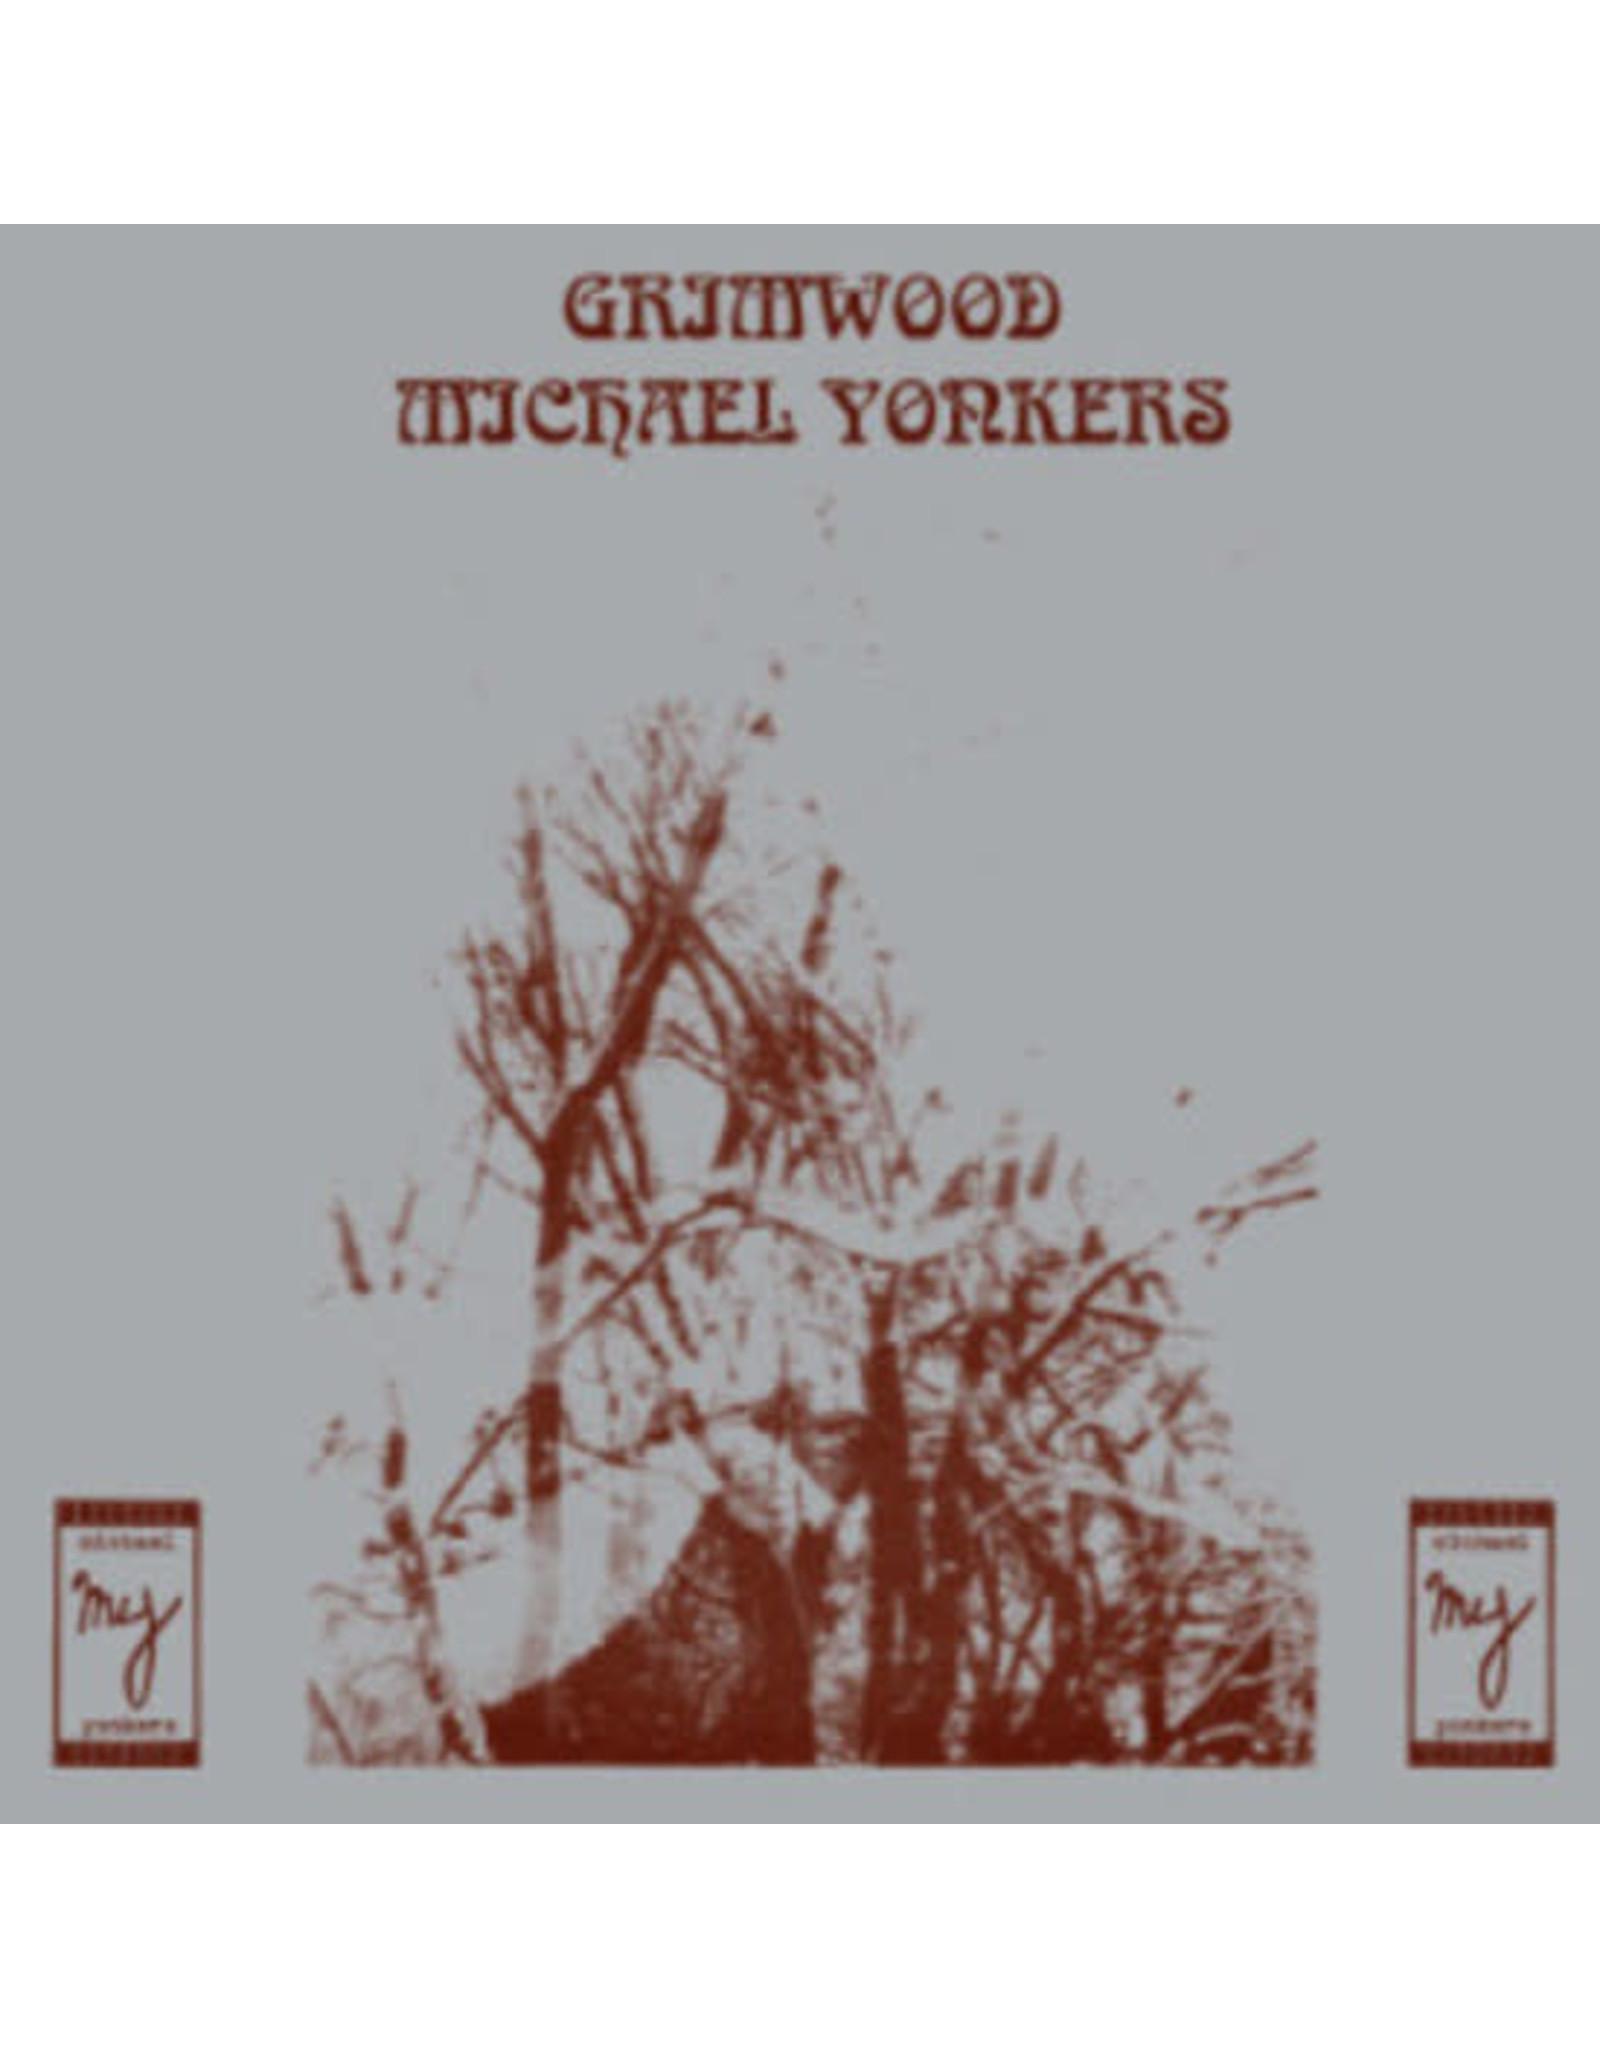 Nero's Neptune Yonkers, Michael: Grimwood LP